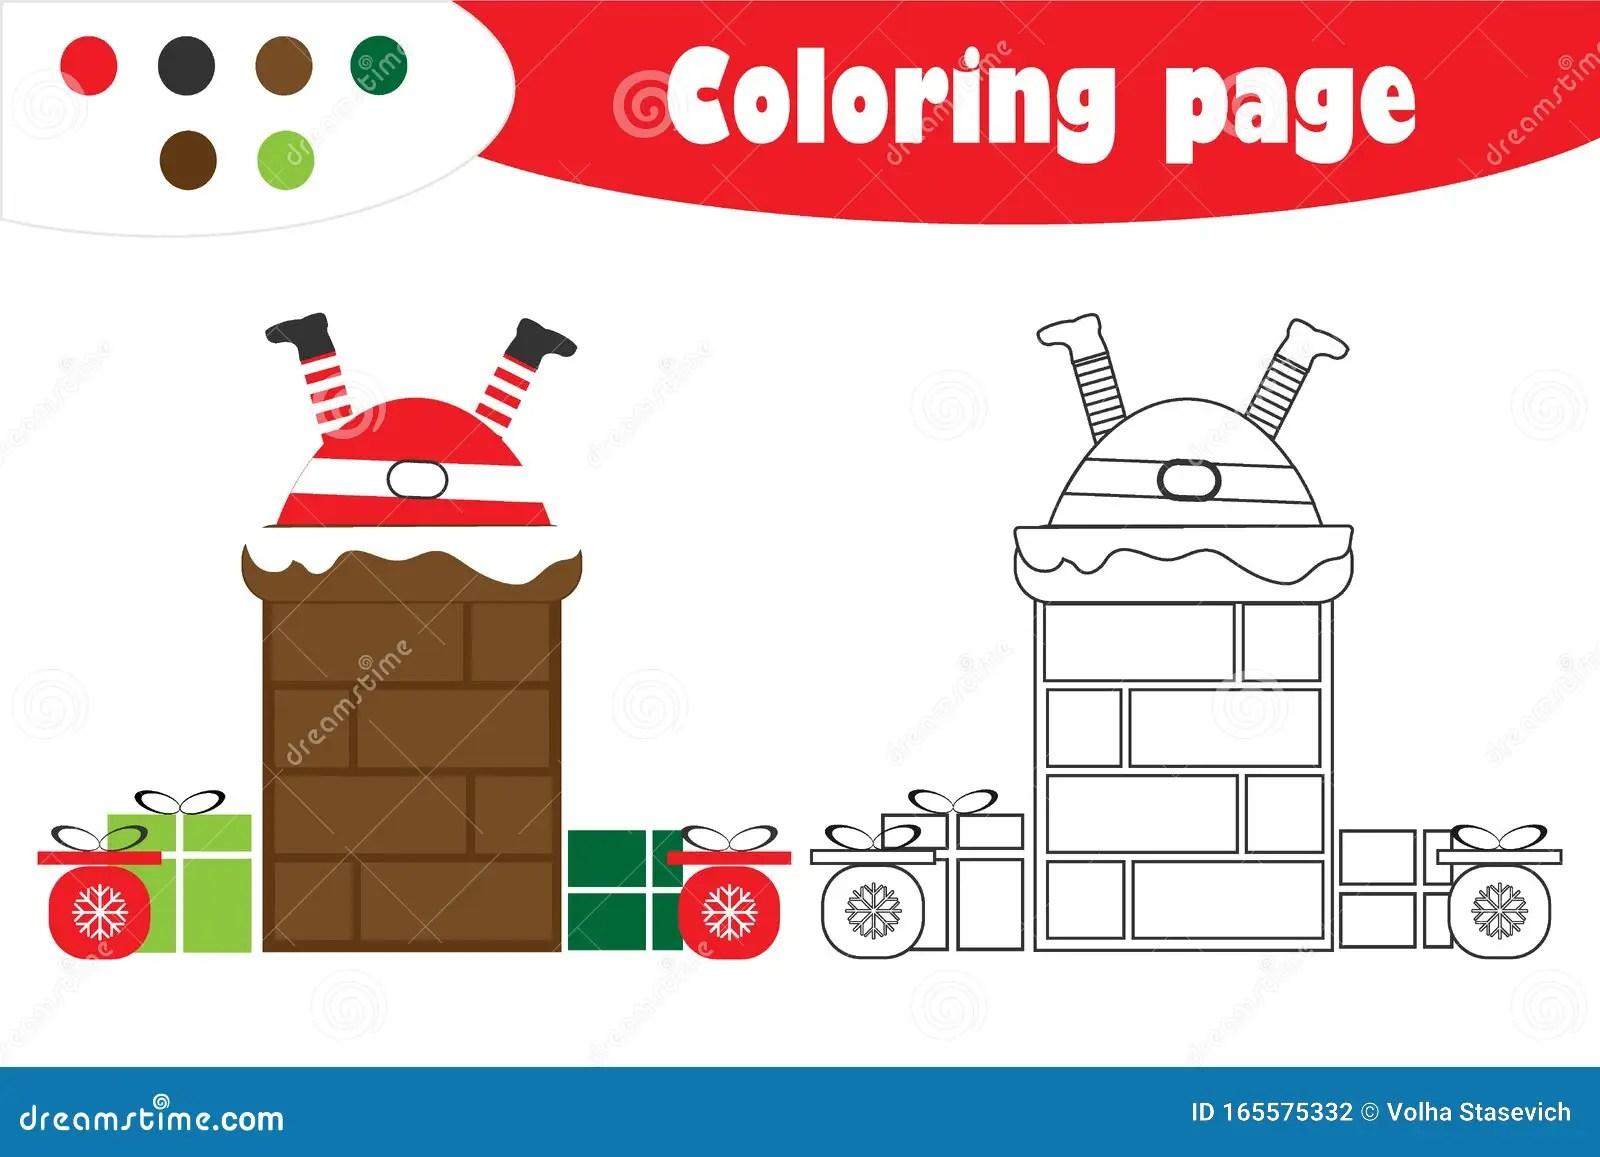 Santa Claus In Chimney In Cartoon Style Christmas